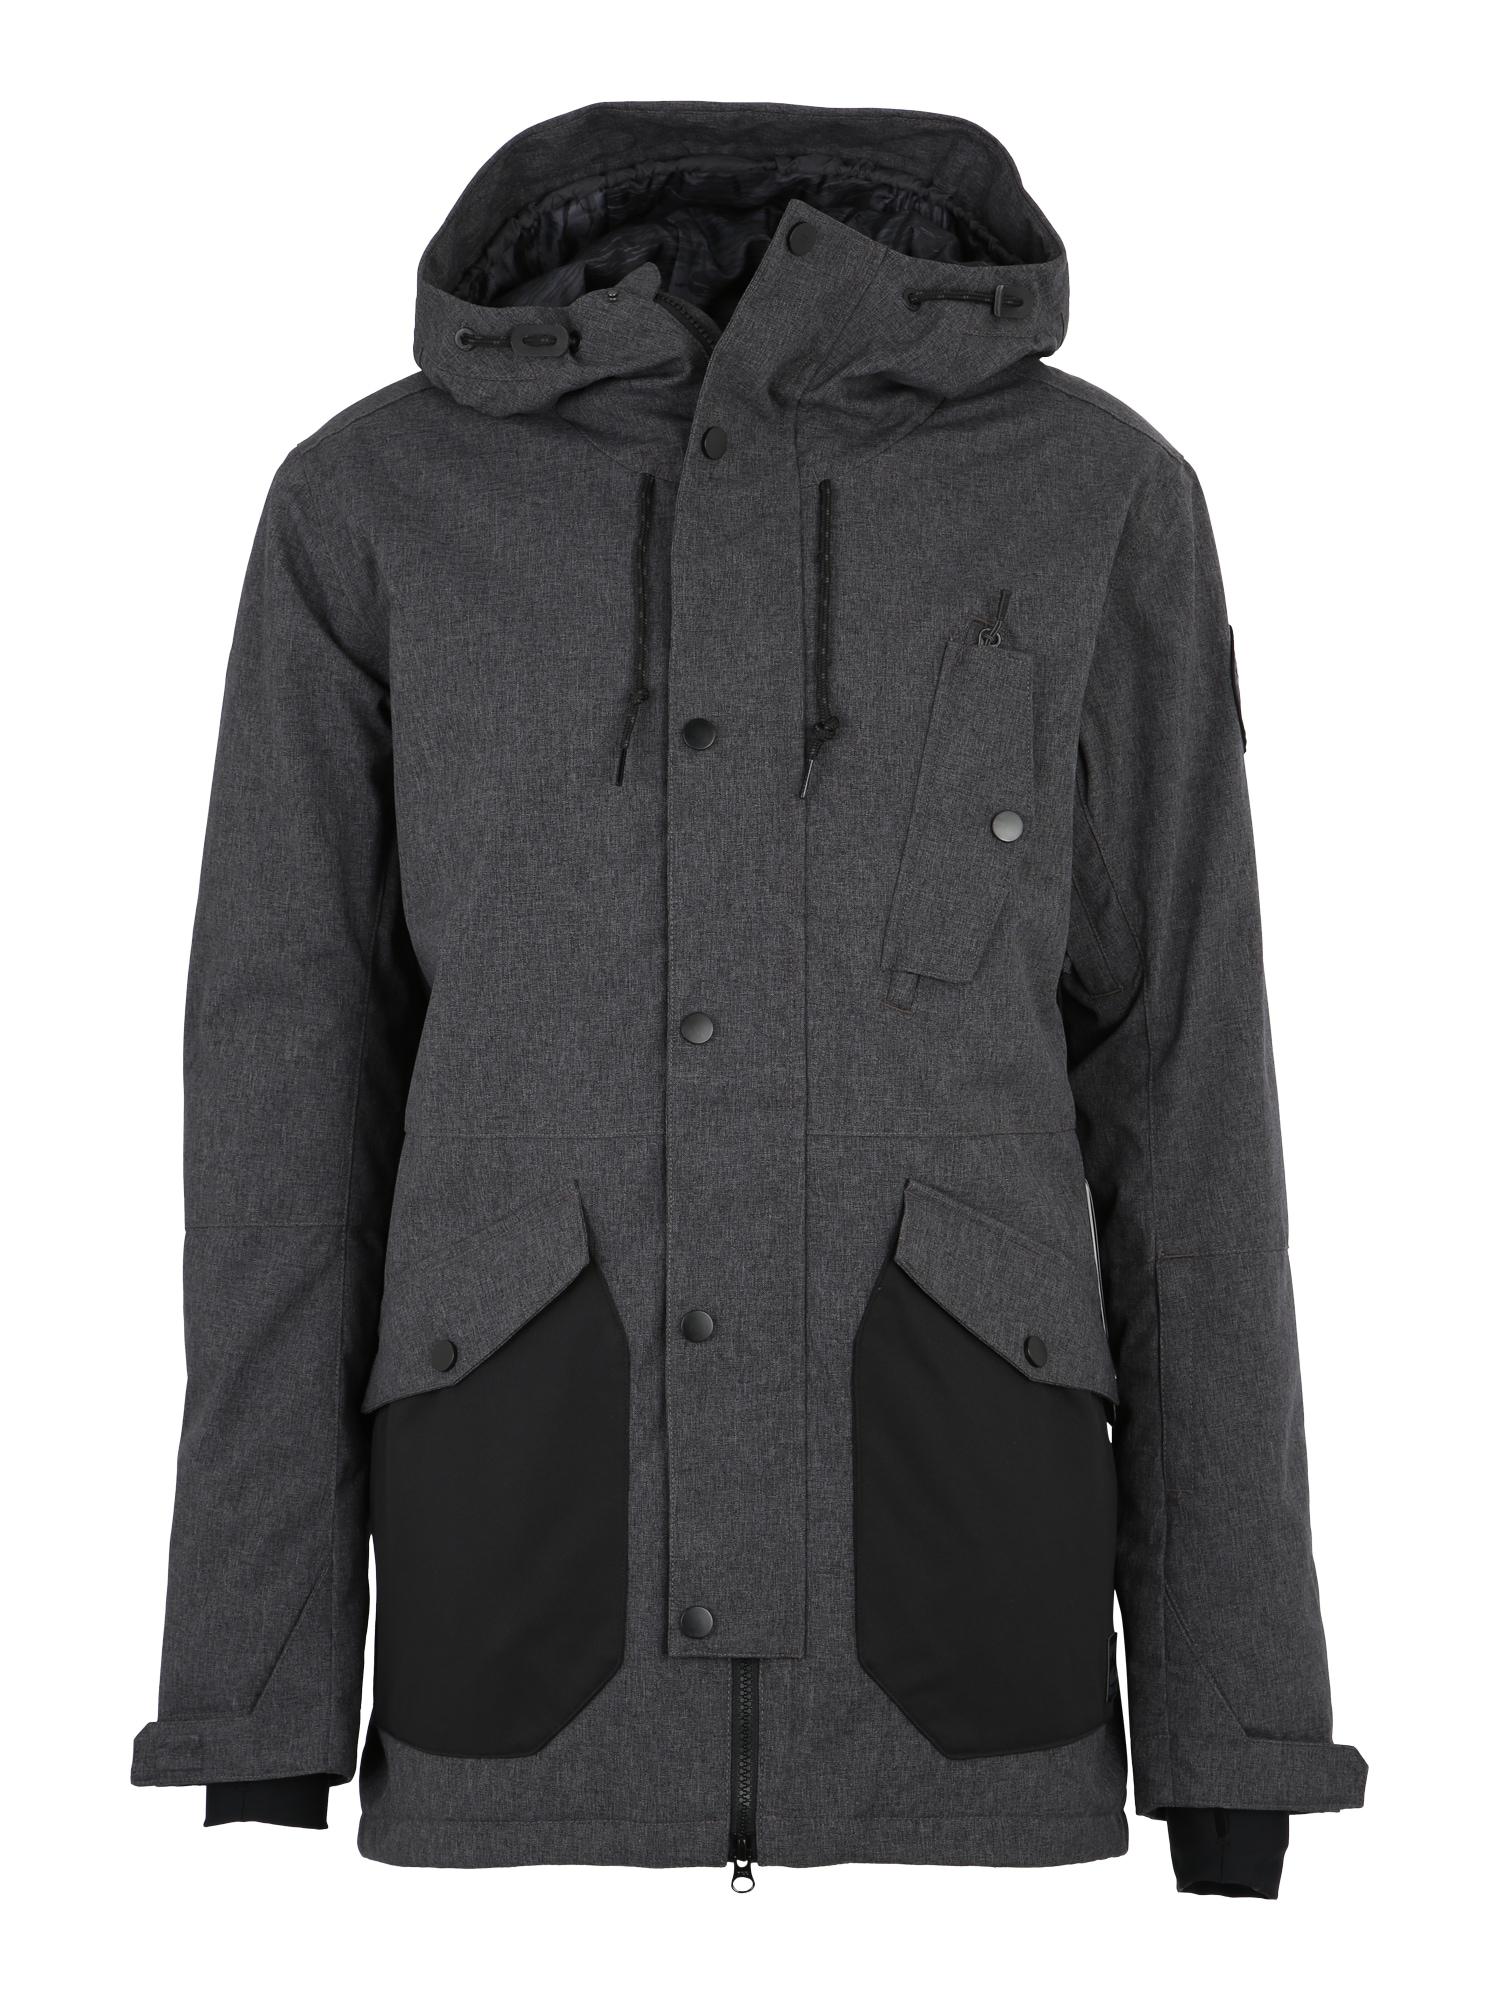 Outdoorová bunda Adversary antracitová tmavě šedá BILLABONG